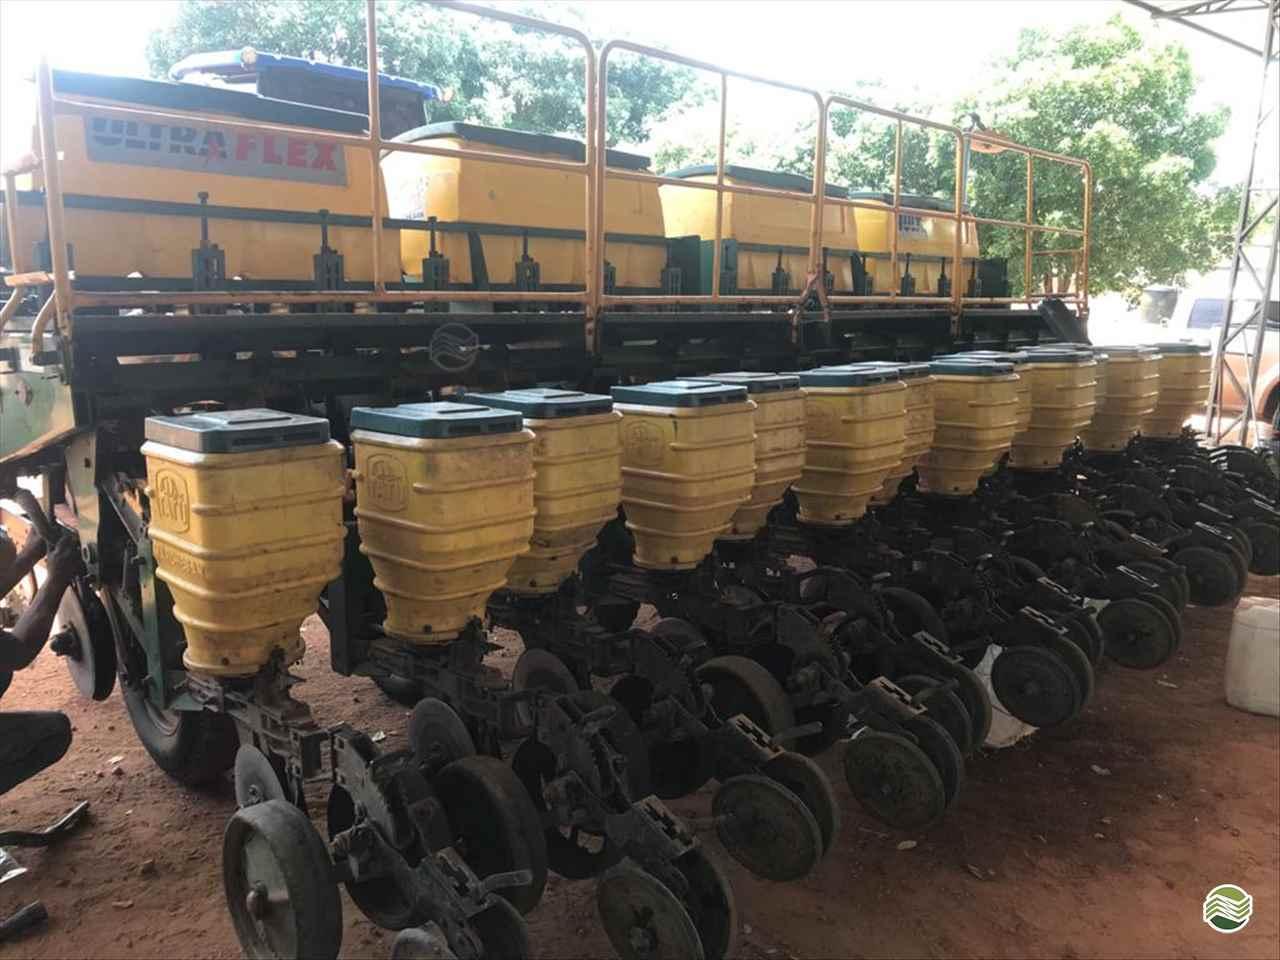 PLANTADEIRA TATU ULTRA FLEX Guimáquina Implementos Agrícolas - Jacto RONDONOPOLIS MATO GROSSO MT